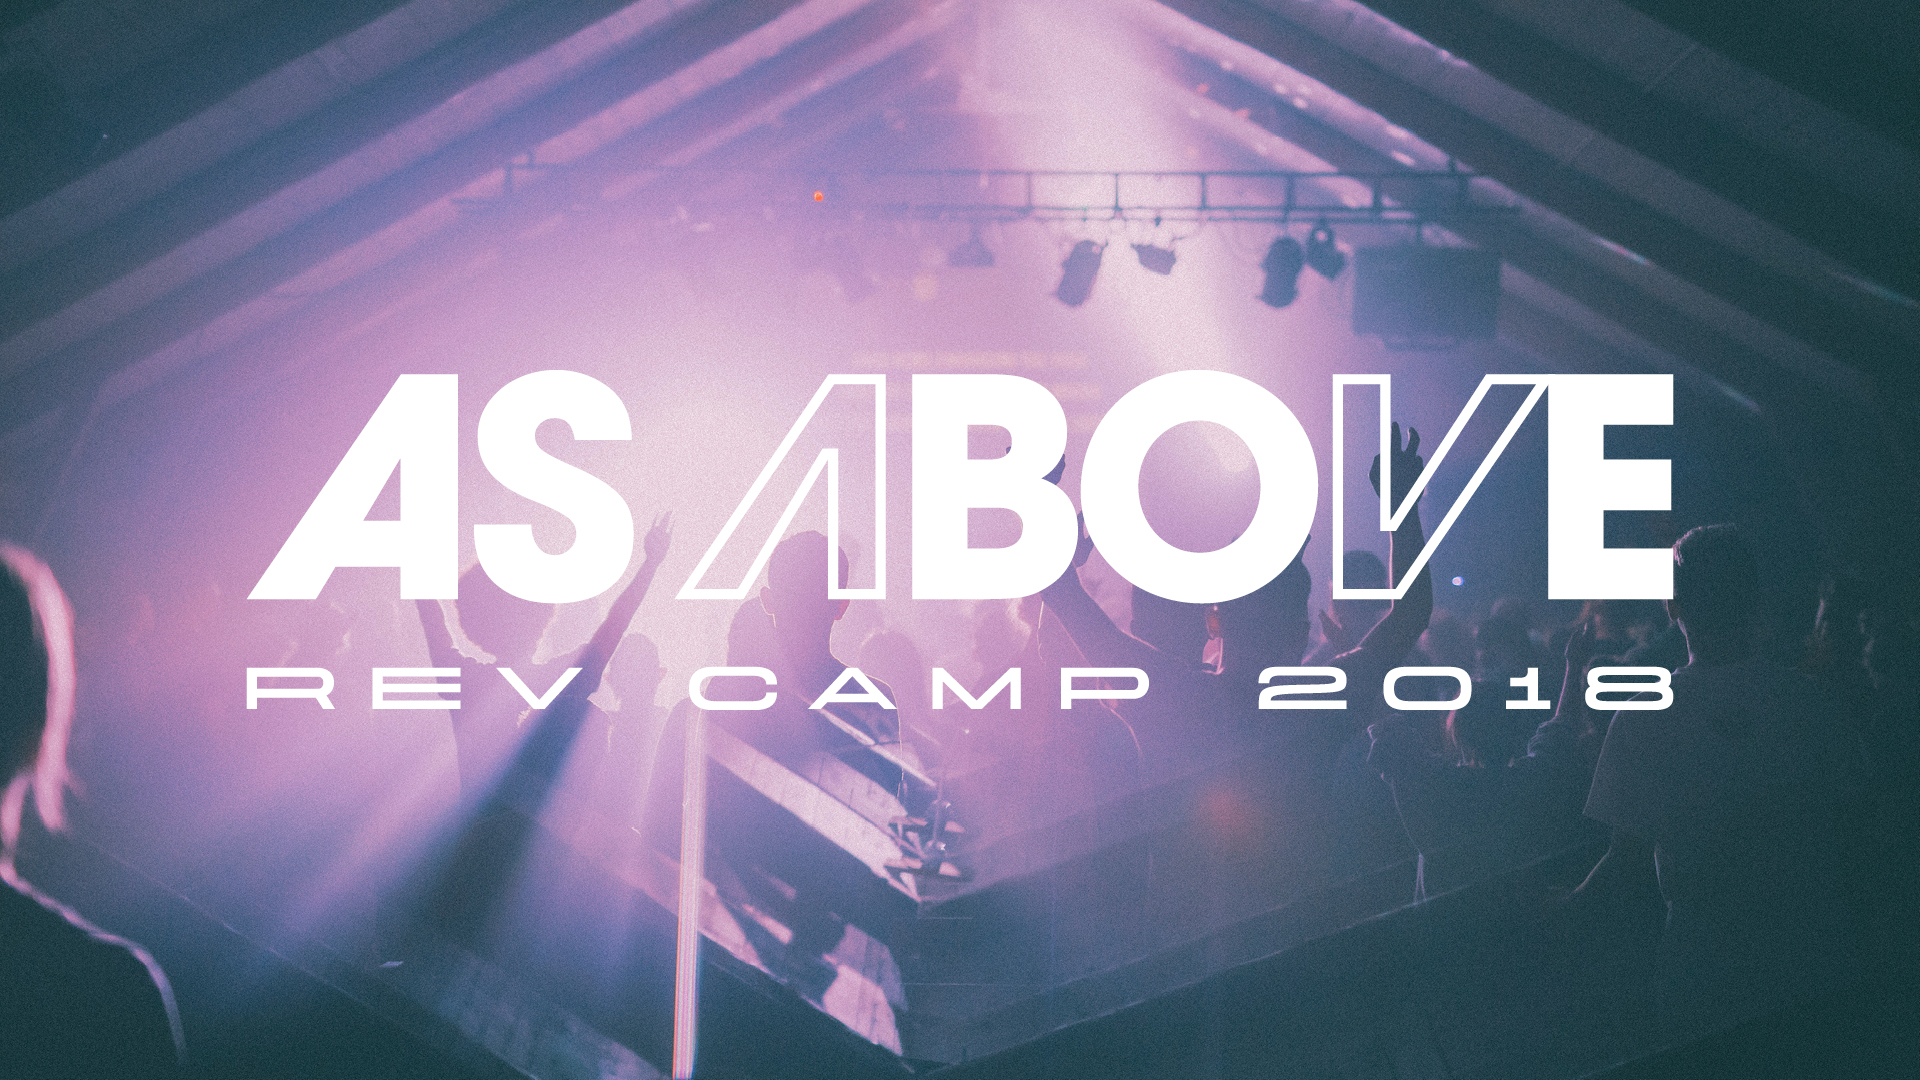 Rev Camp 2018 As Above Generic Slides4.jpg